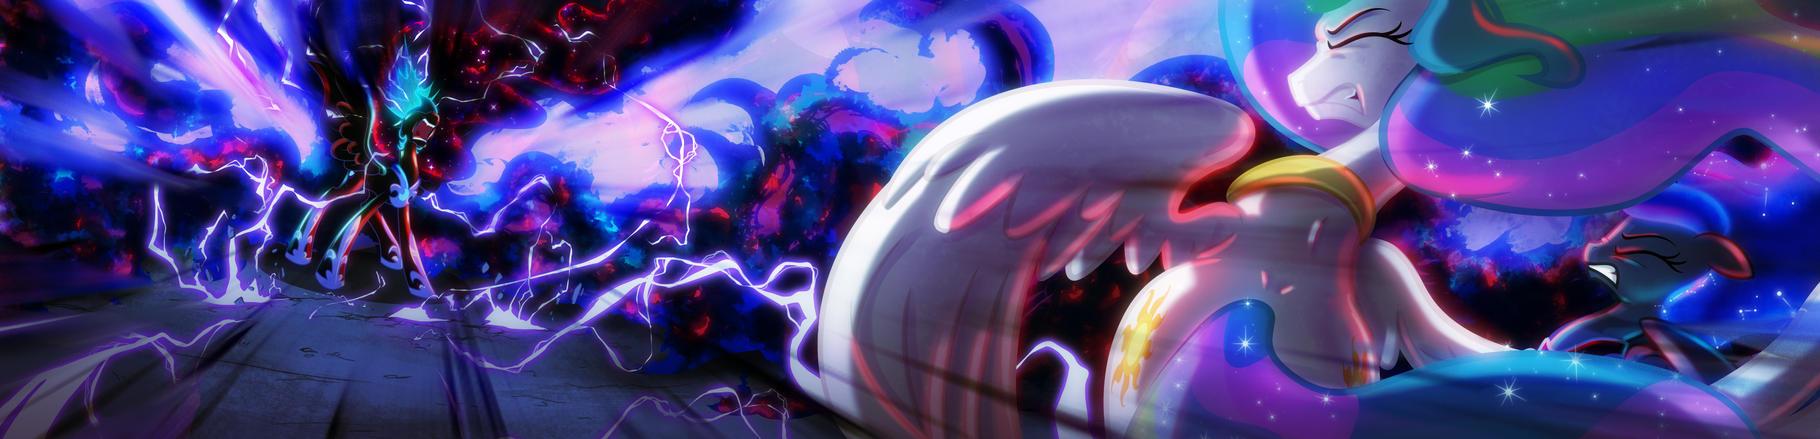 [Lumic4 - Lum and Light] Nightmare Moon Roar by Light262